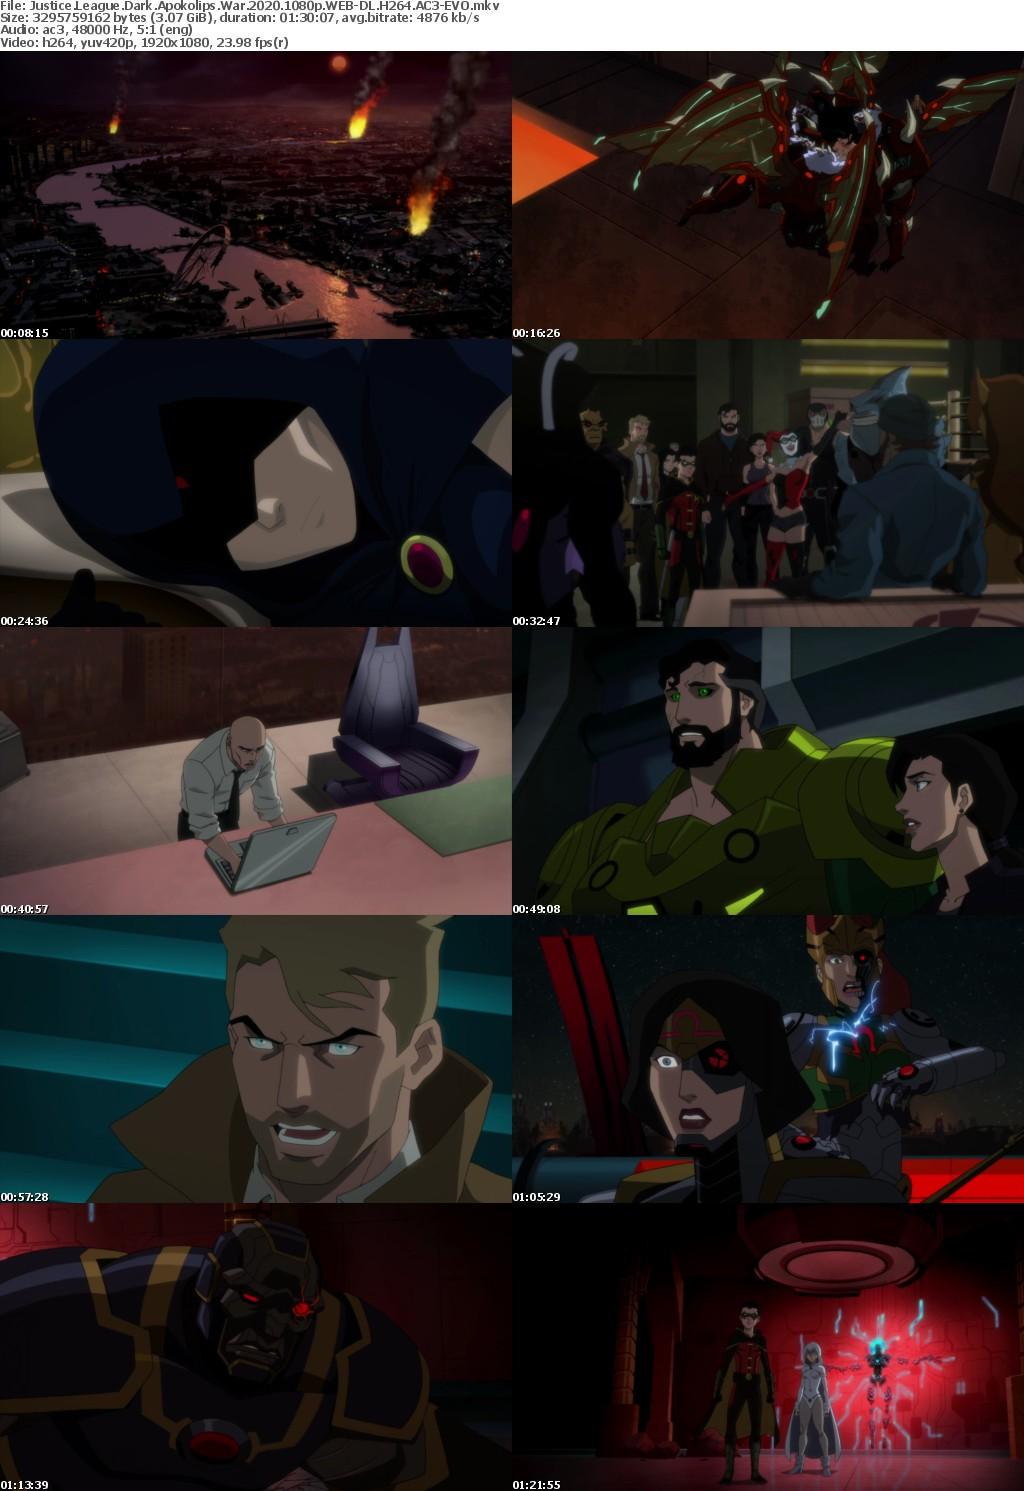 Justice League Dark Apokolips War (2020) 1080p WEB-DL H264 AC3-EVO